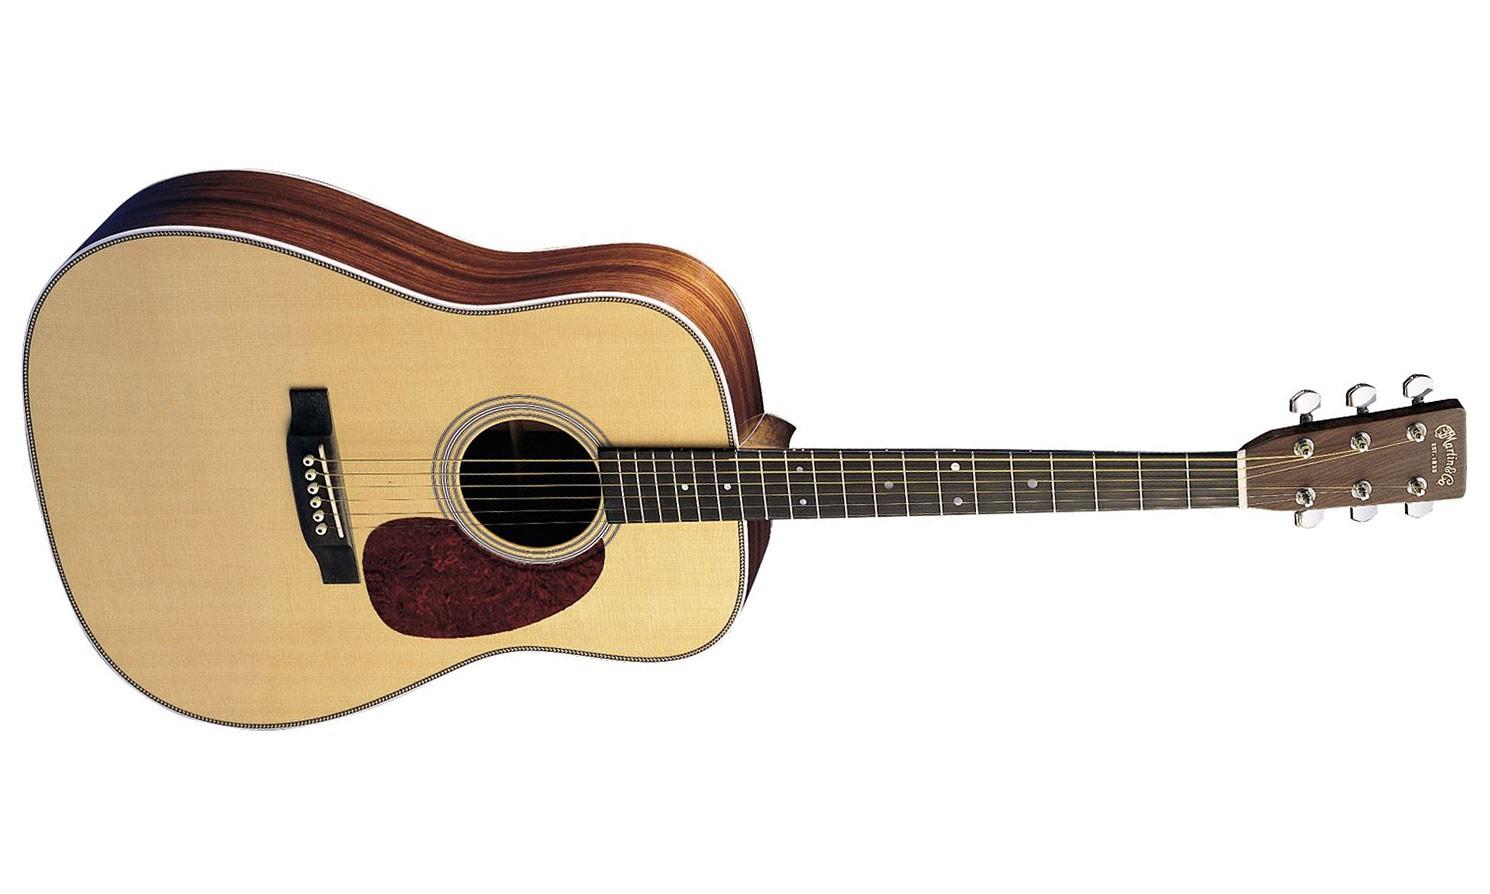 achat guitare c f martin company standard serie hd 28. Black Bedroom Furniture Sets. Home Design Ideas